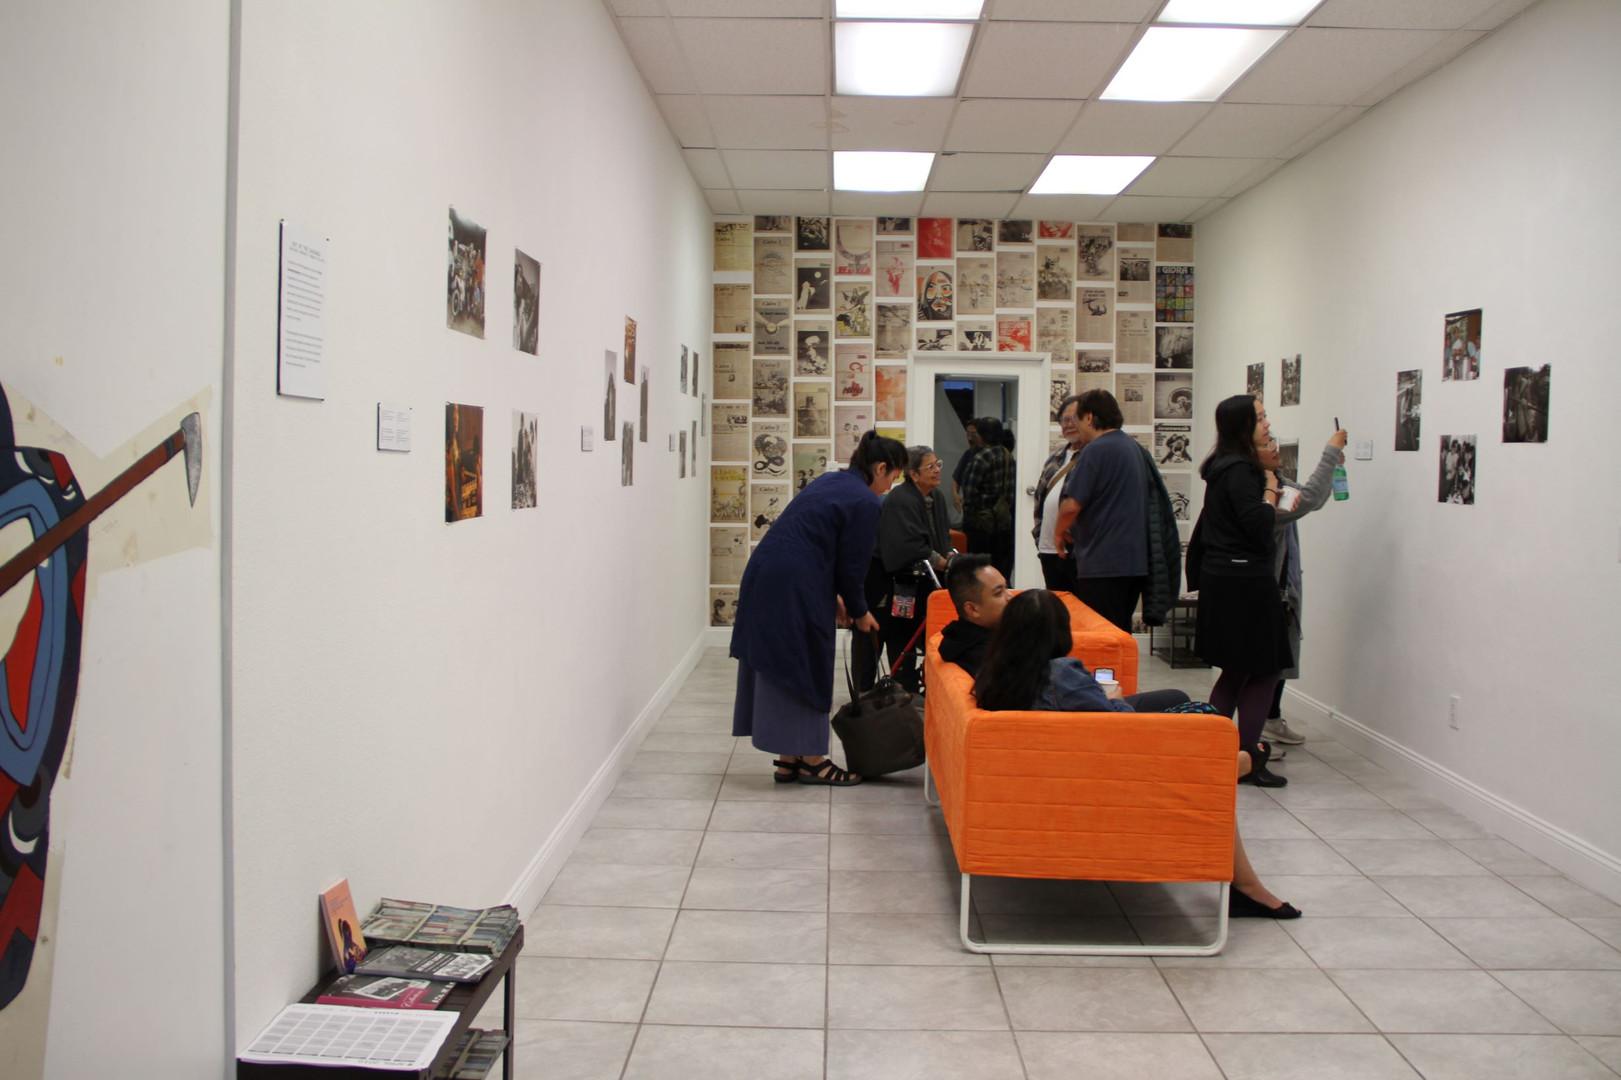 Photo exhibit visitors